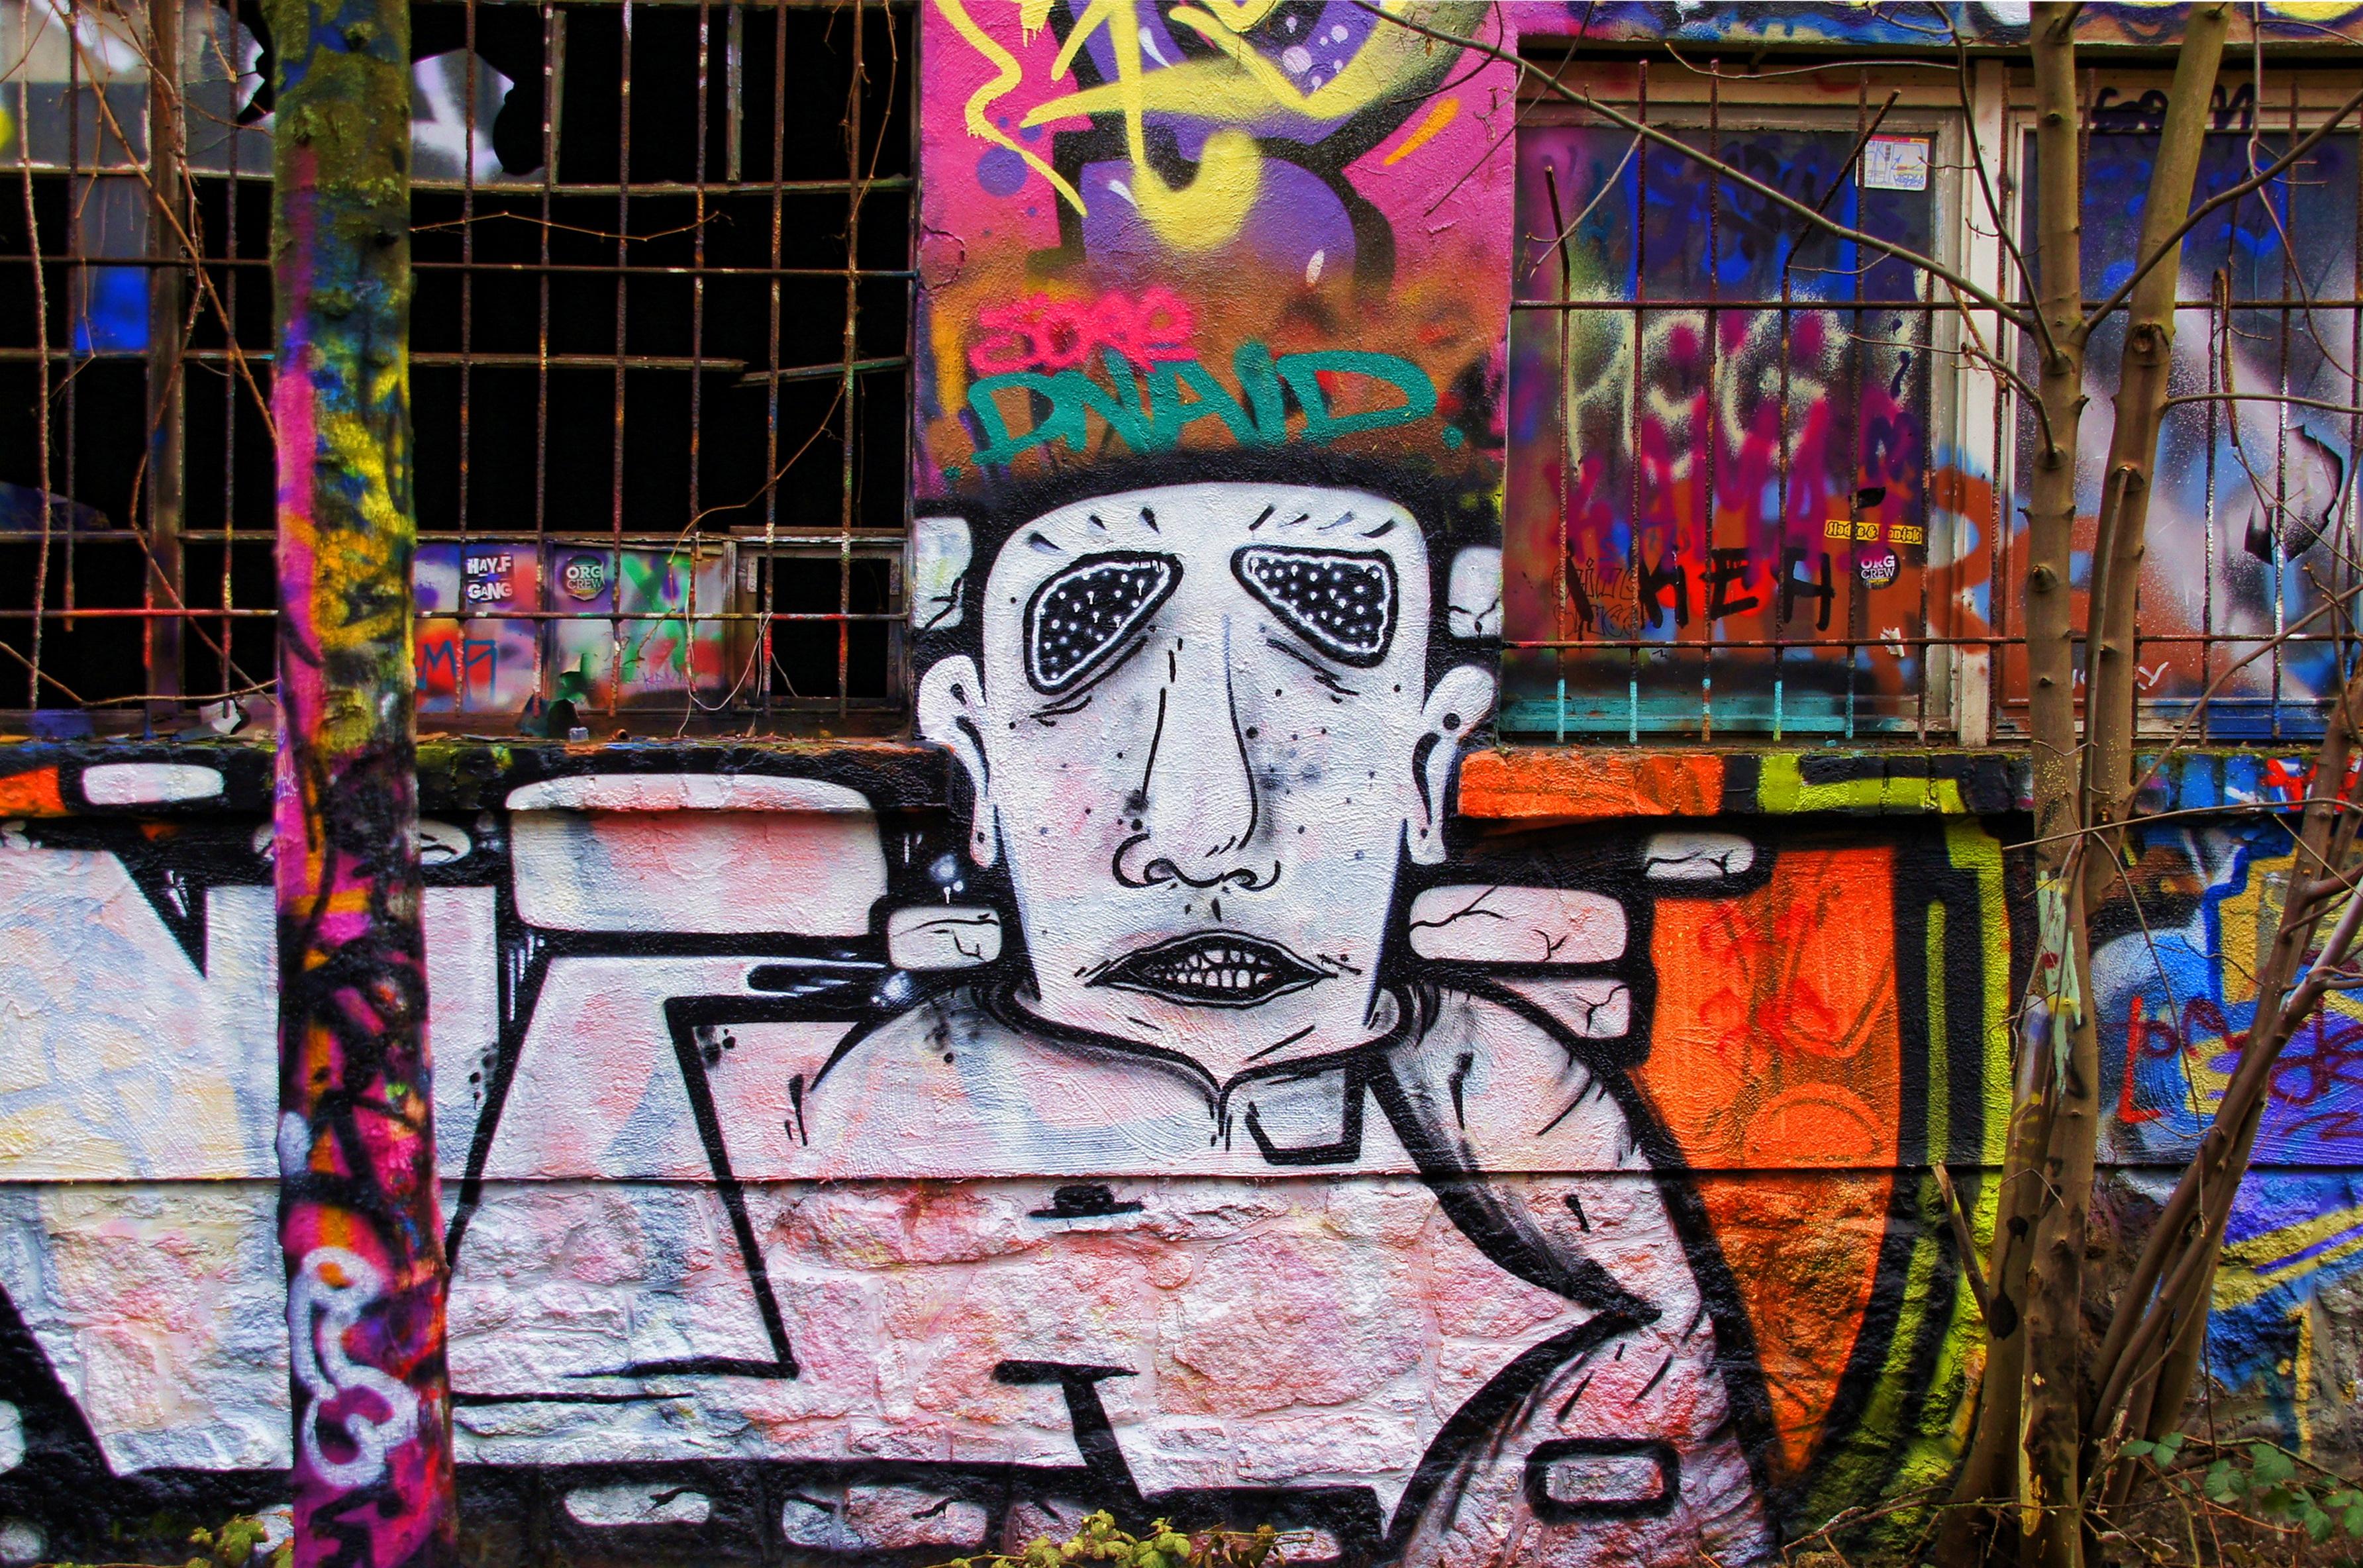 Grafitti wall painting - Road Street Spray Color Graffiti Painting Street Art Art Leipzig Wall Painting Sprayer Hauswand Urban Area